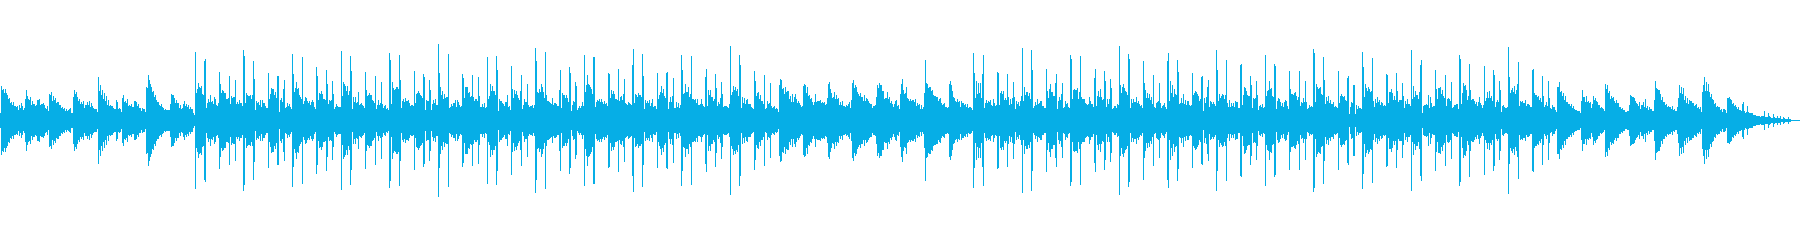 Simple Lo-fi Hip Hop rain sound's reproduced waveform